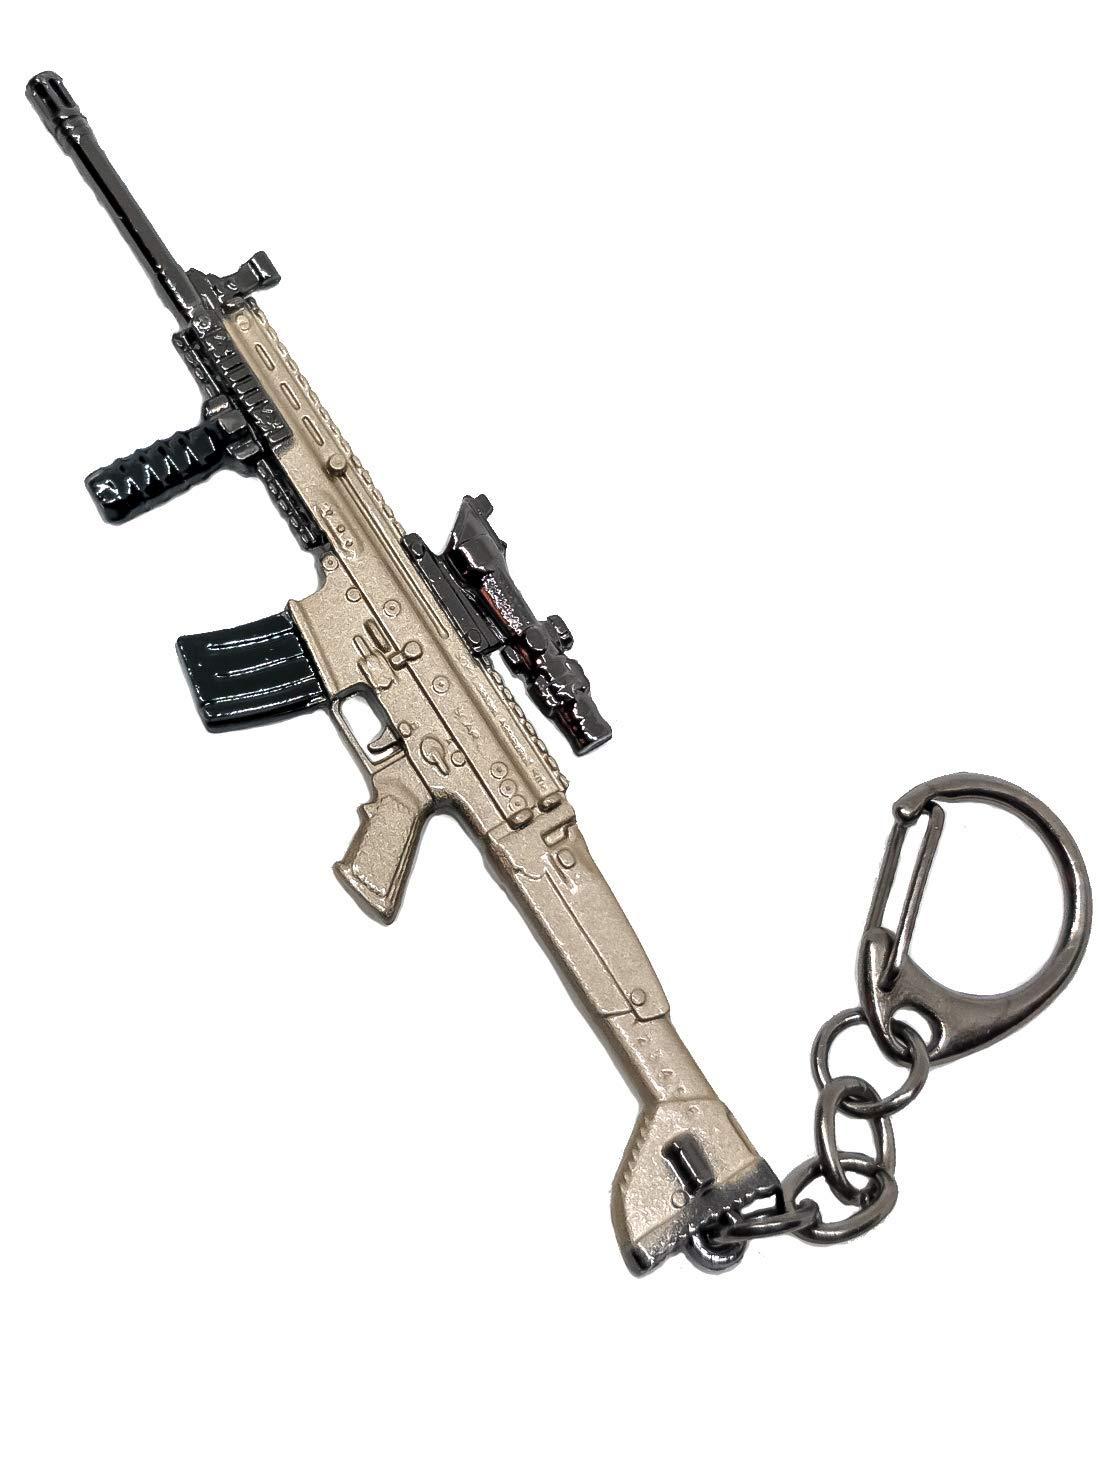 Inestimable Collection PUBG Scar-L Llavero Pistola: Amazon ...